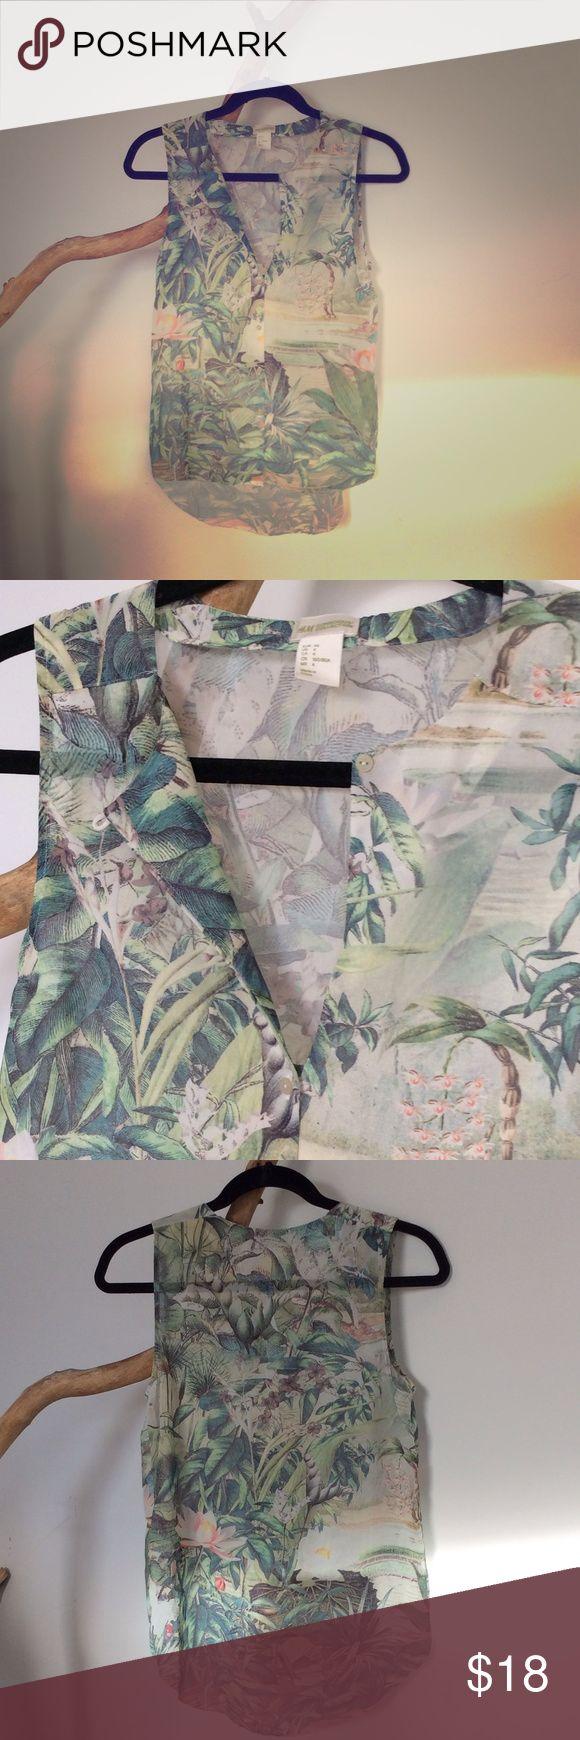 Jungle floral chiffon shirt Chiffon tropical jungle sleeveless shirt H&M Tops Blouses